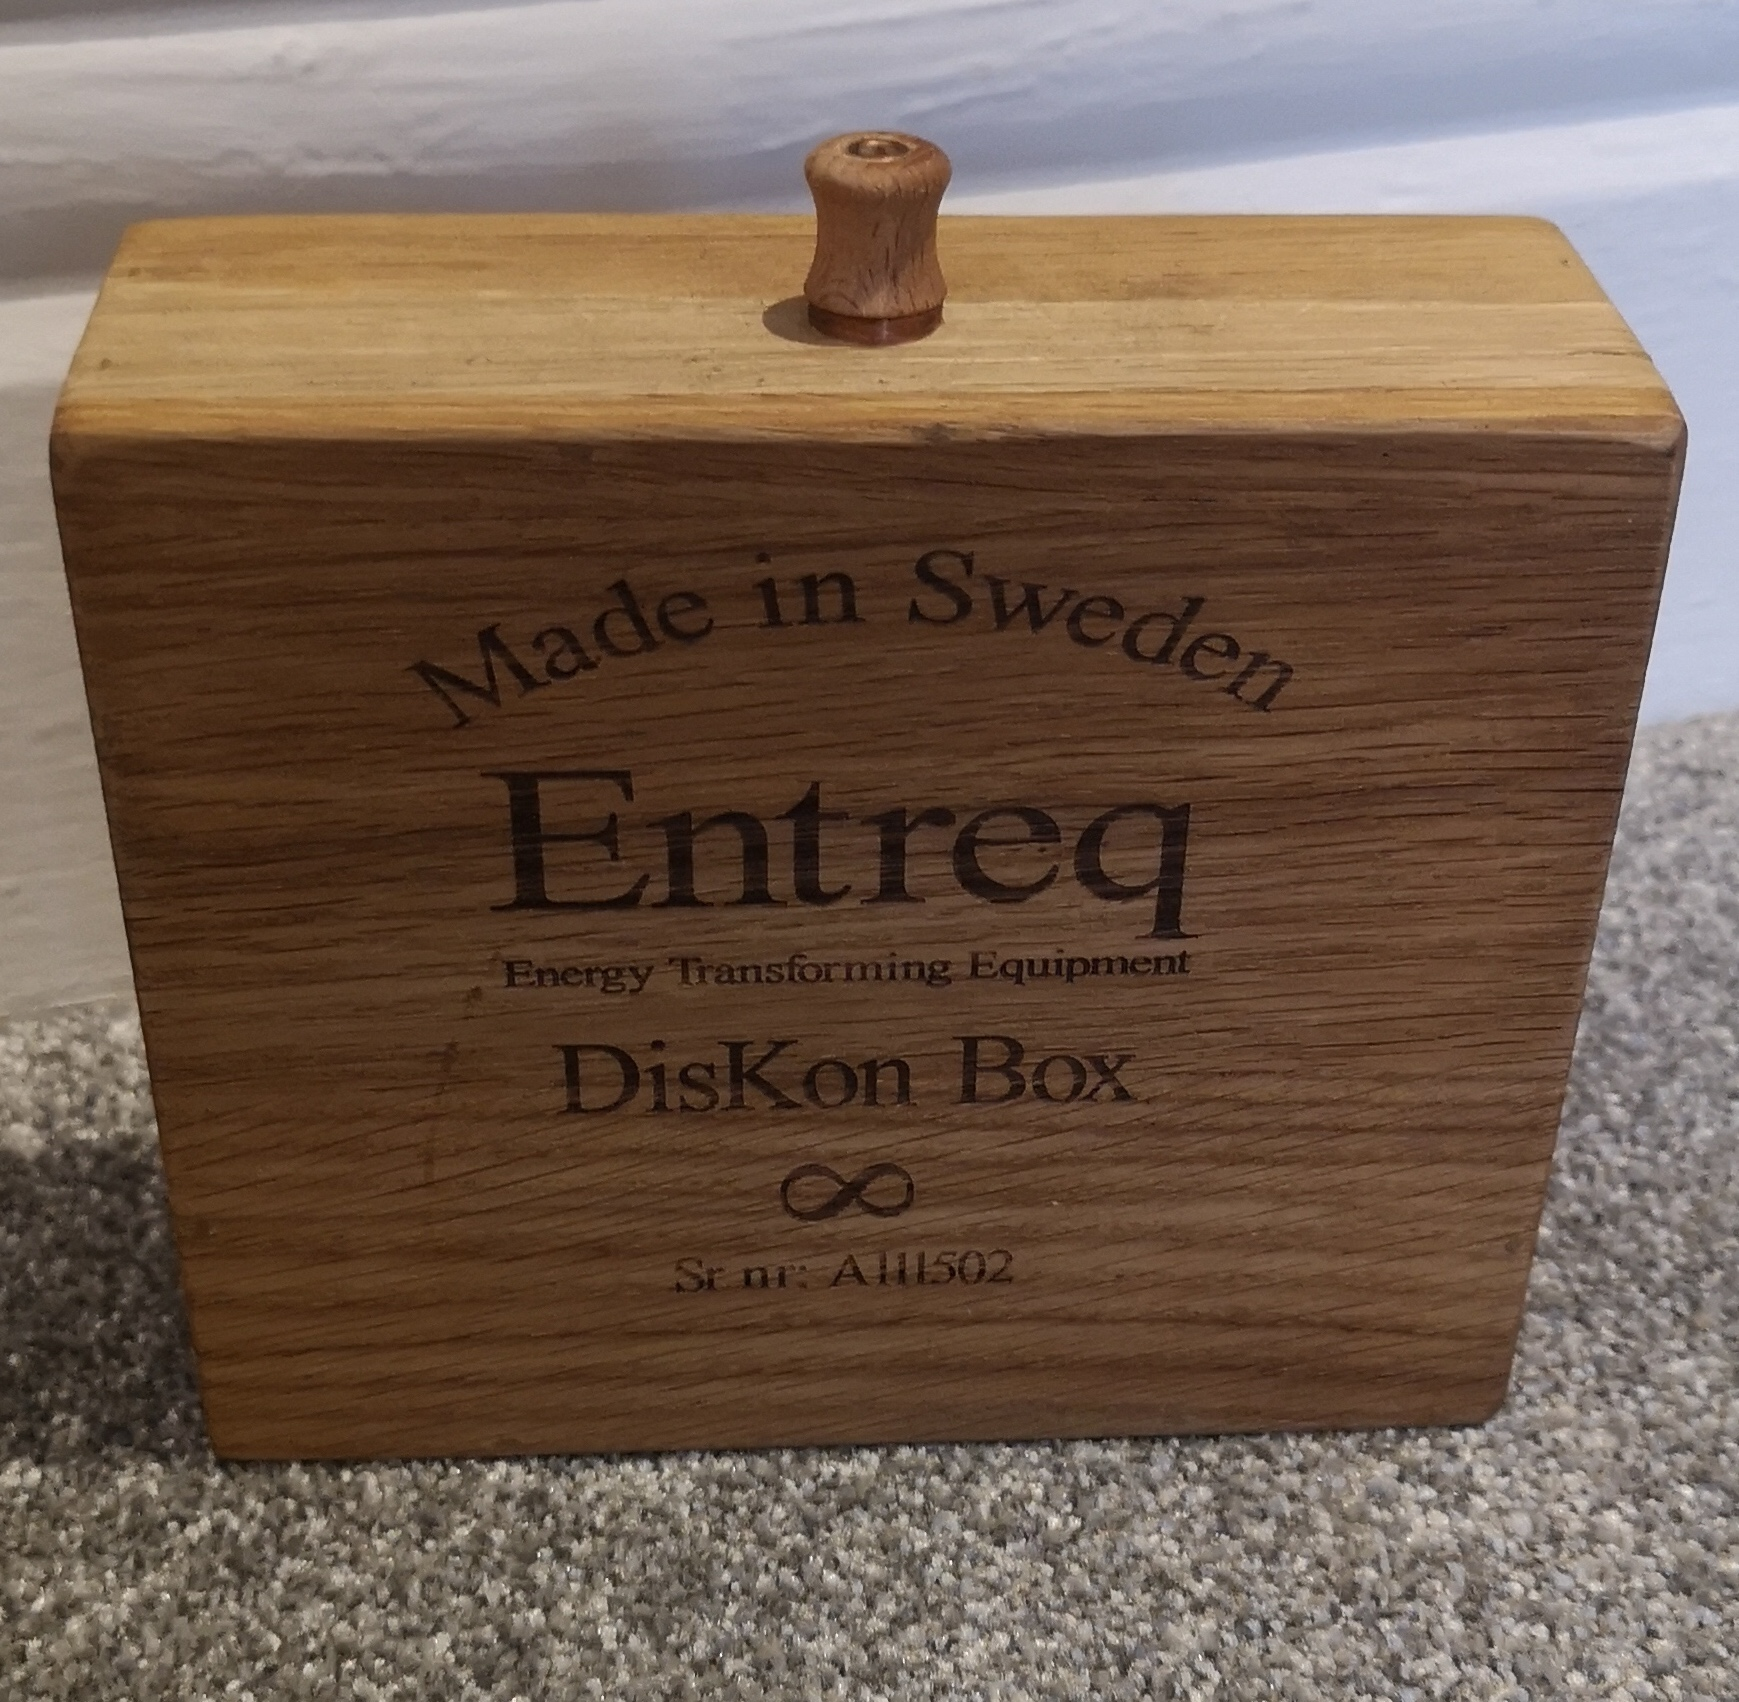 Entreq Diskon Ground Box @ Audio Therapy